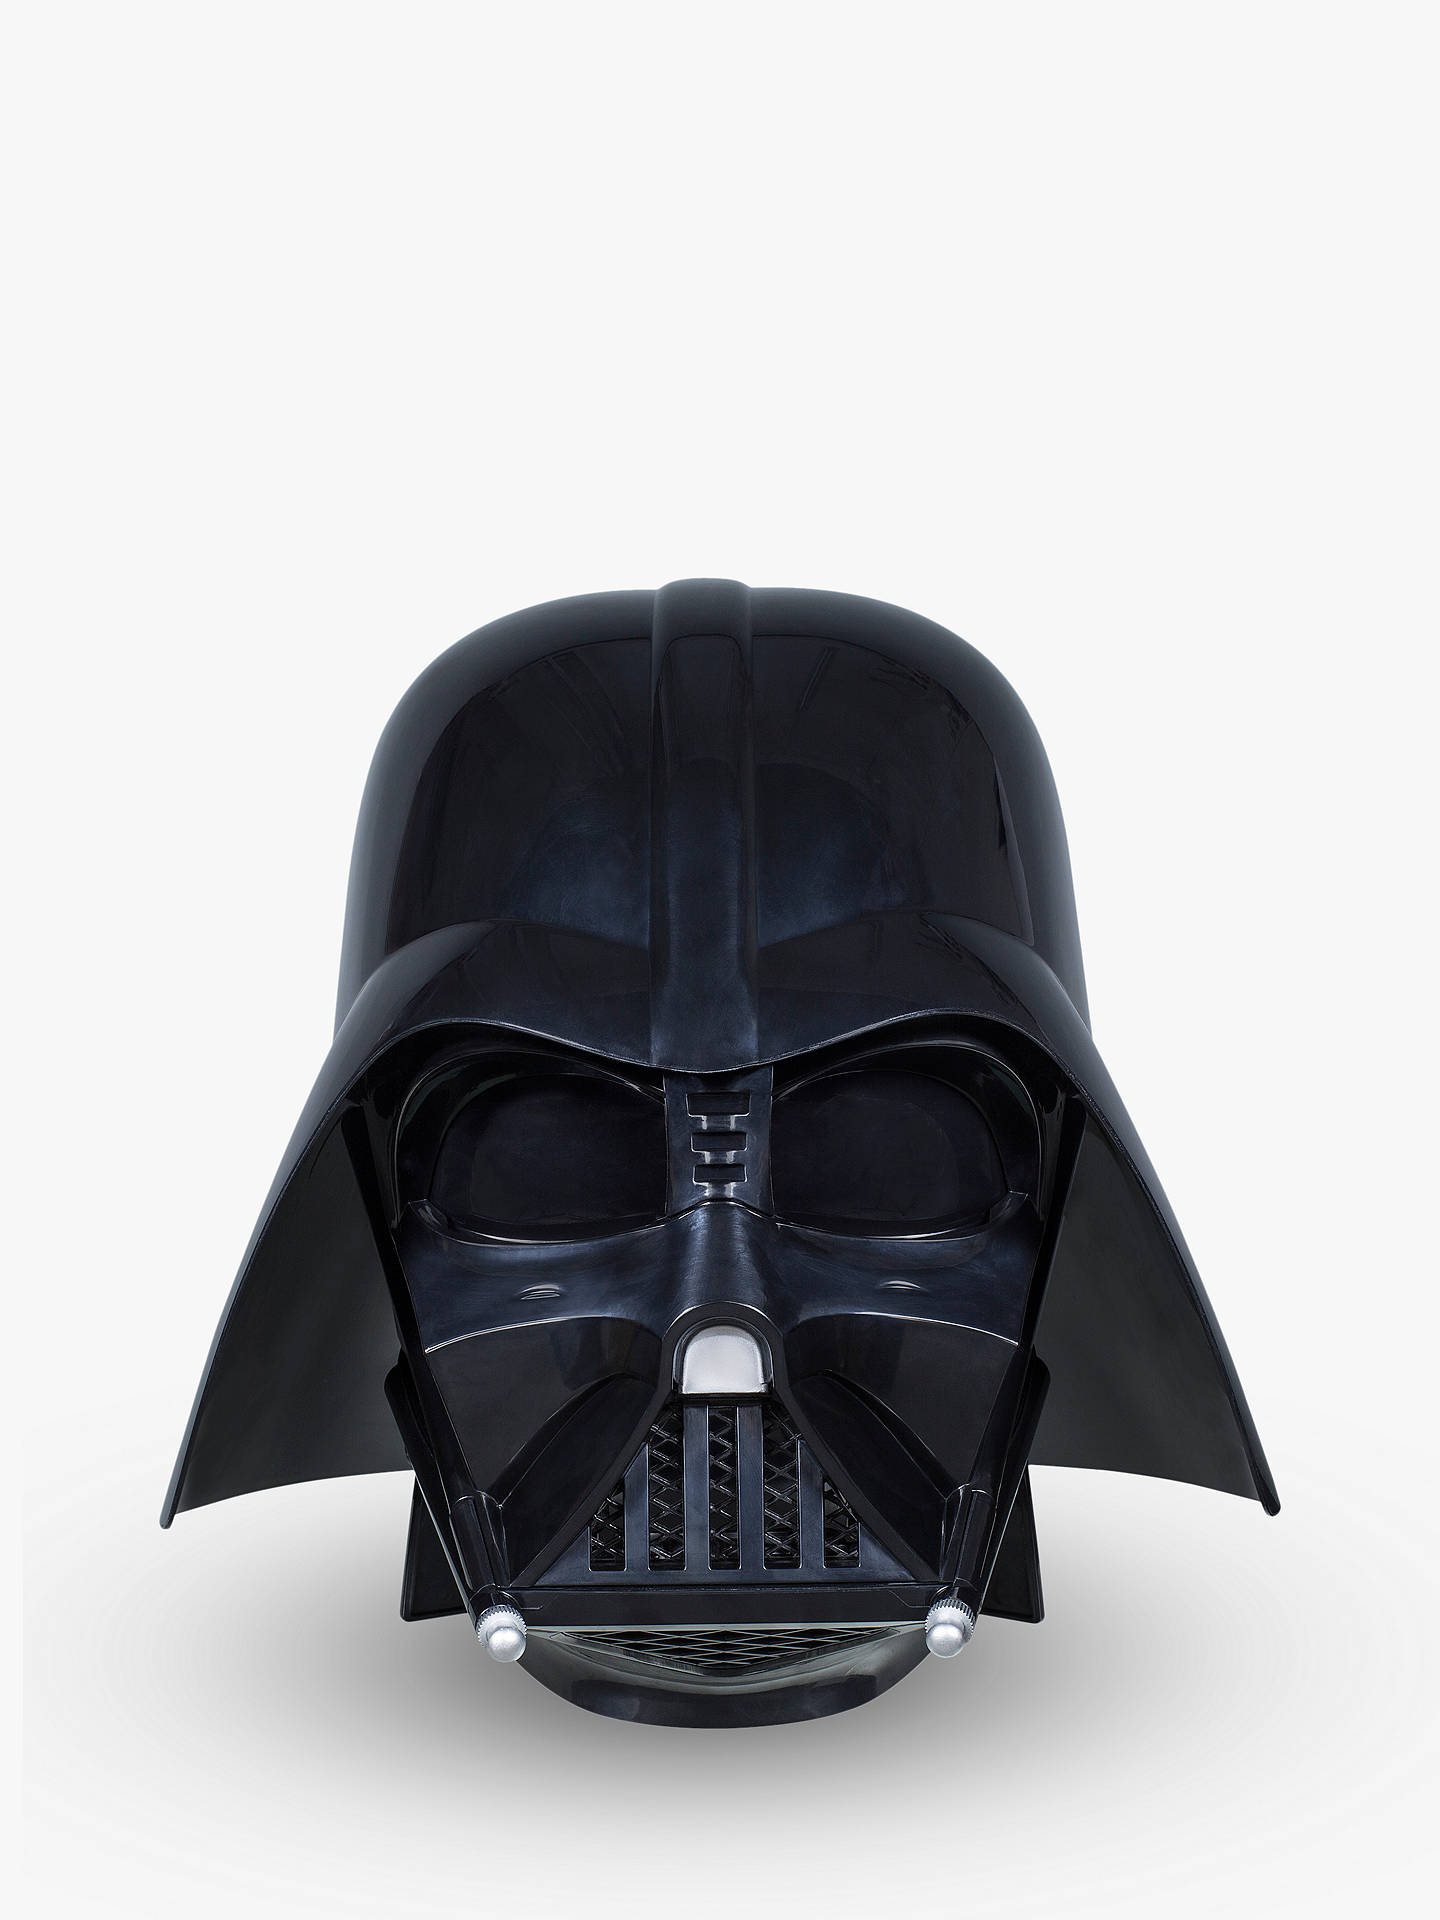 68dd6f60c Buy Star Wars The Black Series Darth Vader Premium Electronic Helmet Online  at johnlewis.com ...